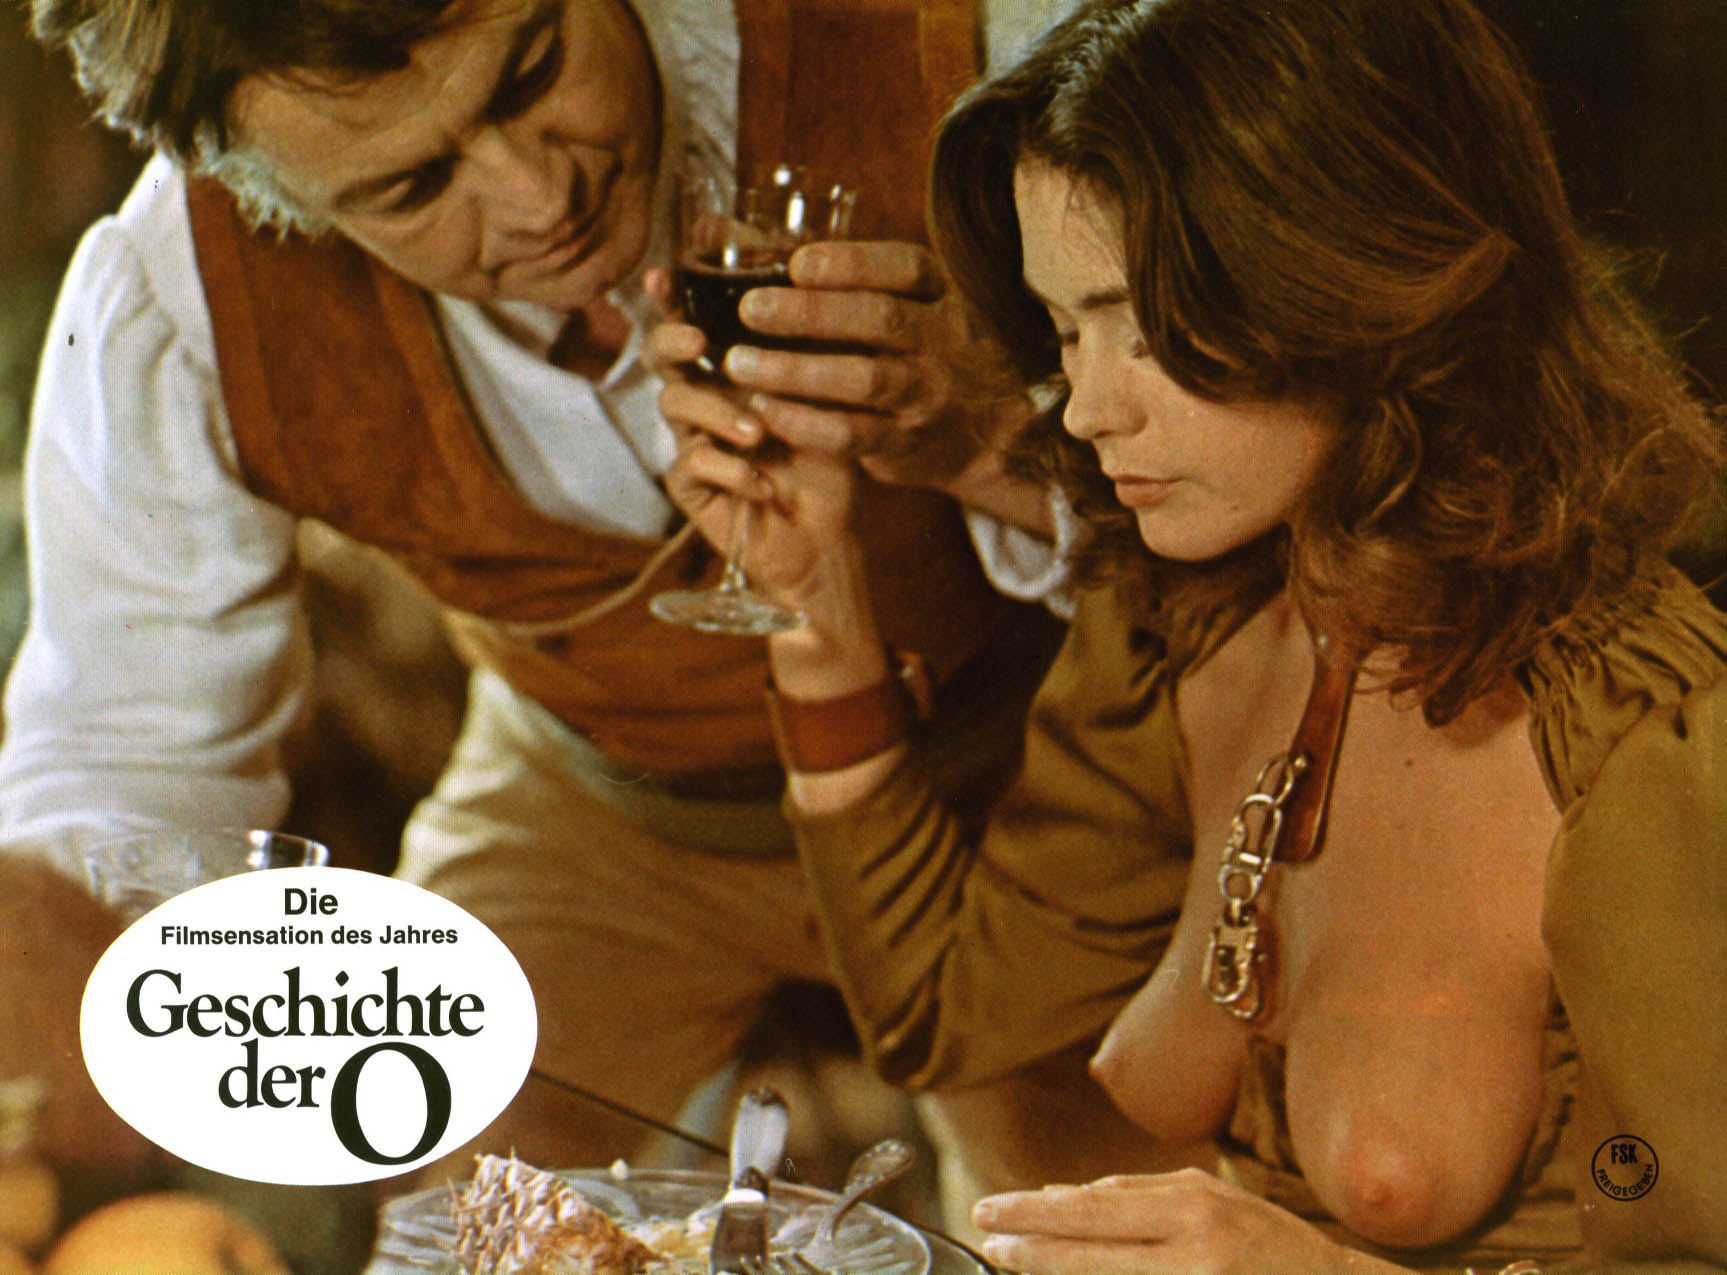 sexuelle erniedrigung bdsm katalog